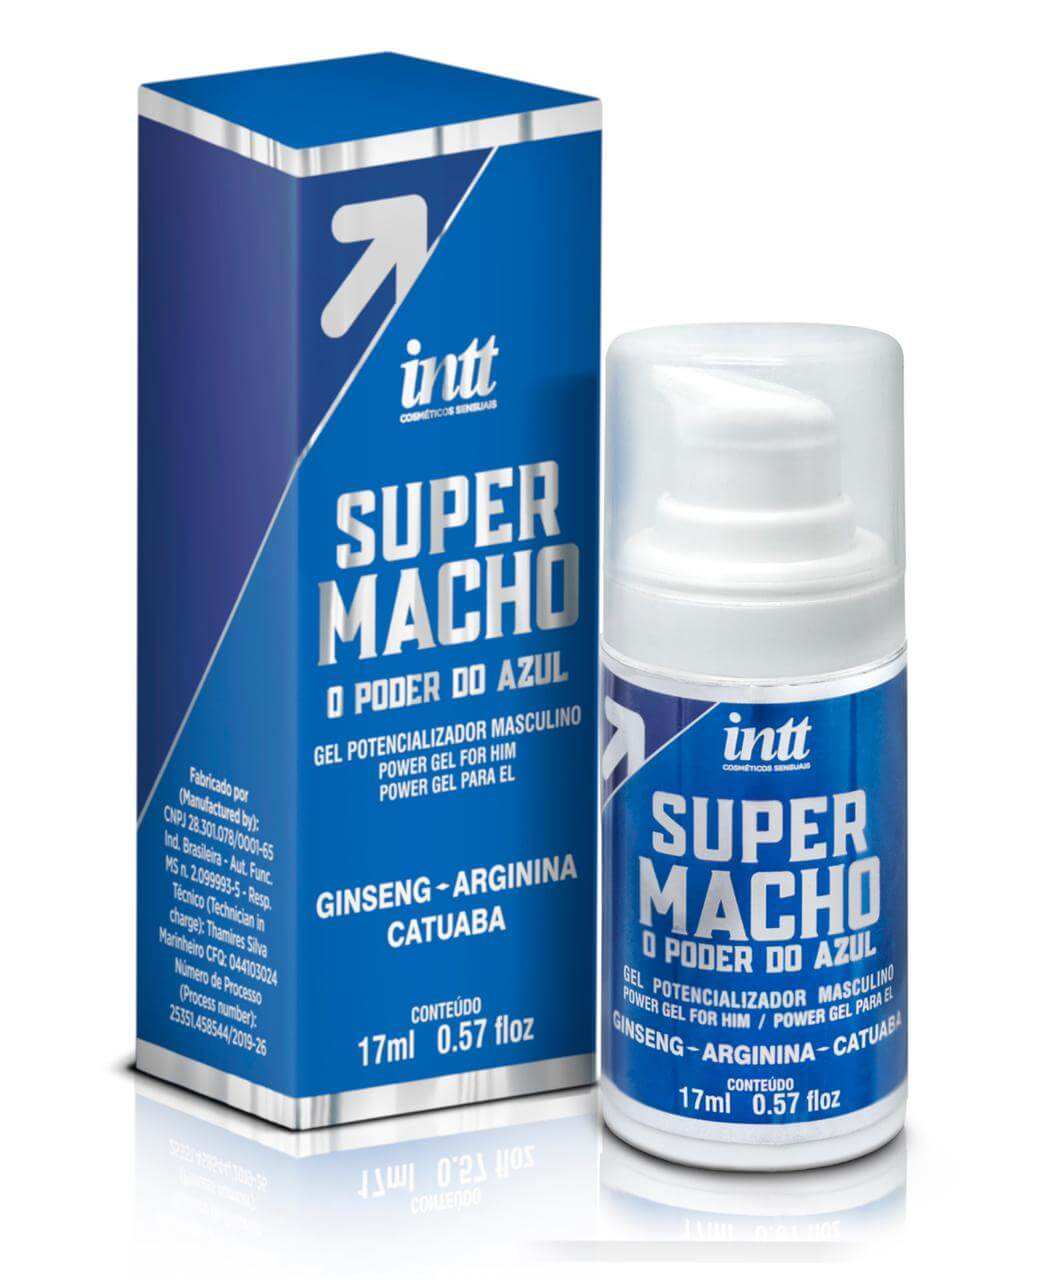 Gel Potencializador Masculino - Poder do Azul - SUPER MACHO